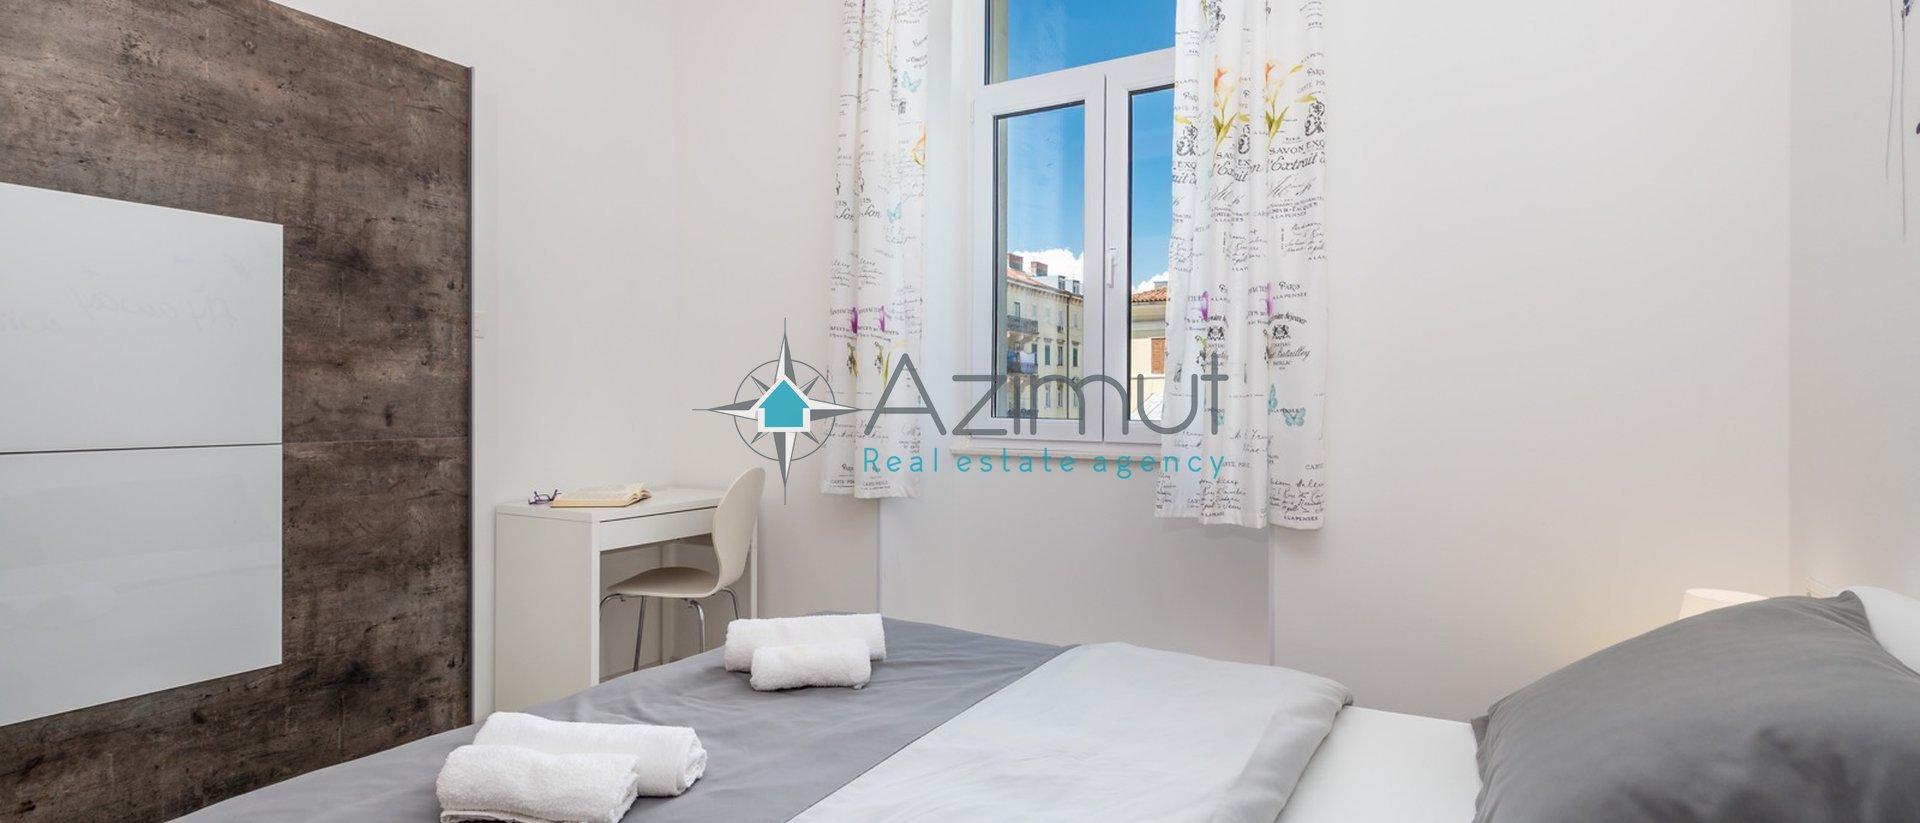 Appartamento, 100 m2, Vendita, Rijeka - Centar